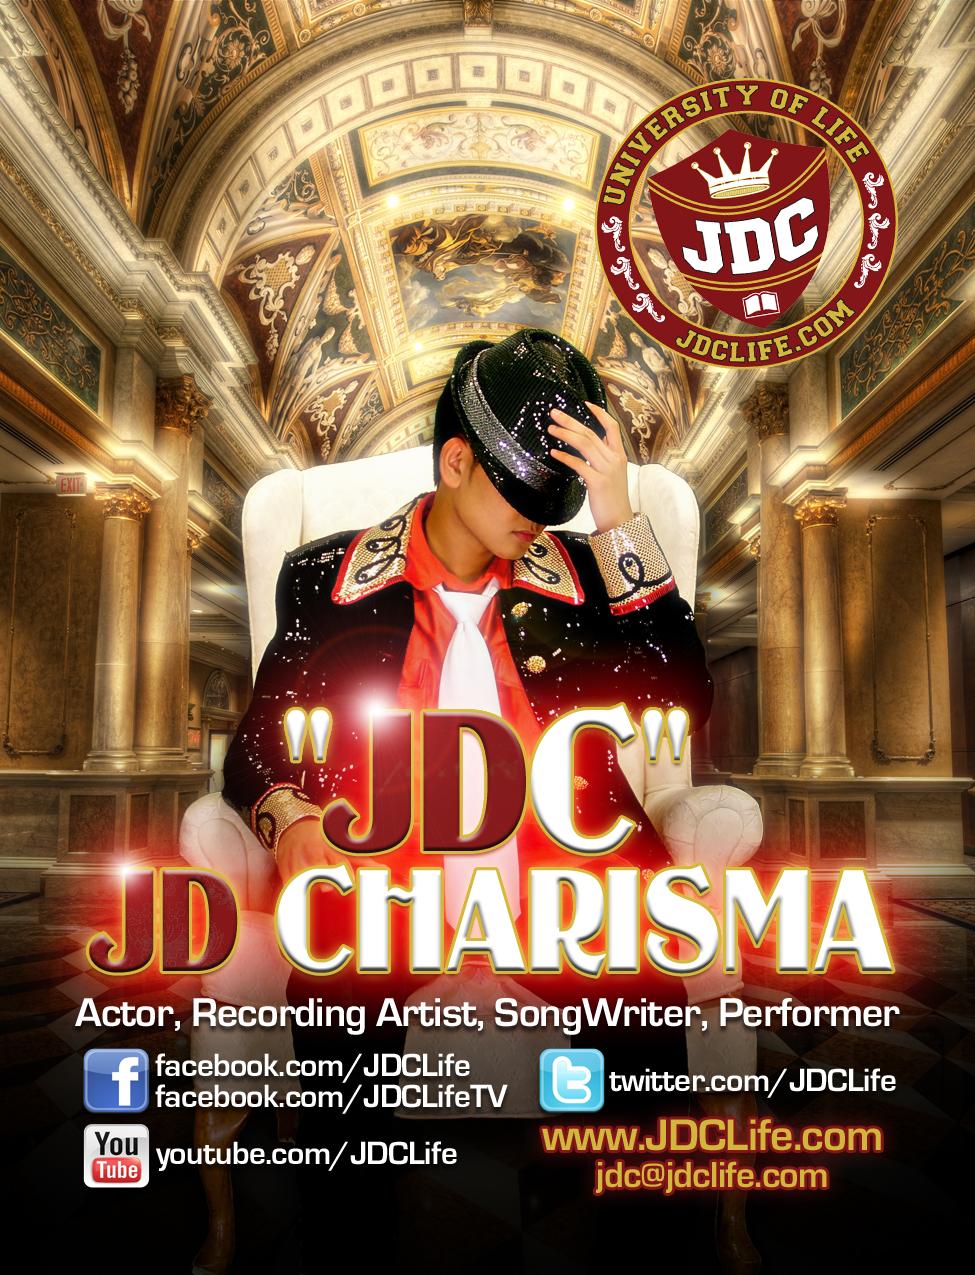 JDCharisma[3x4]f2.jpg